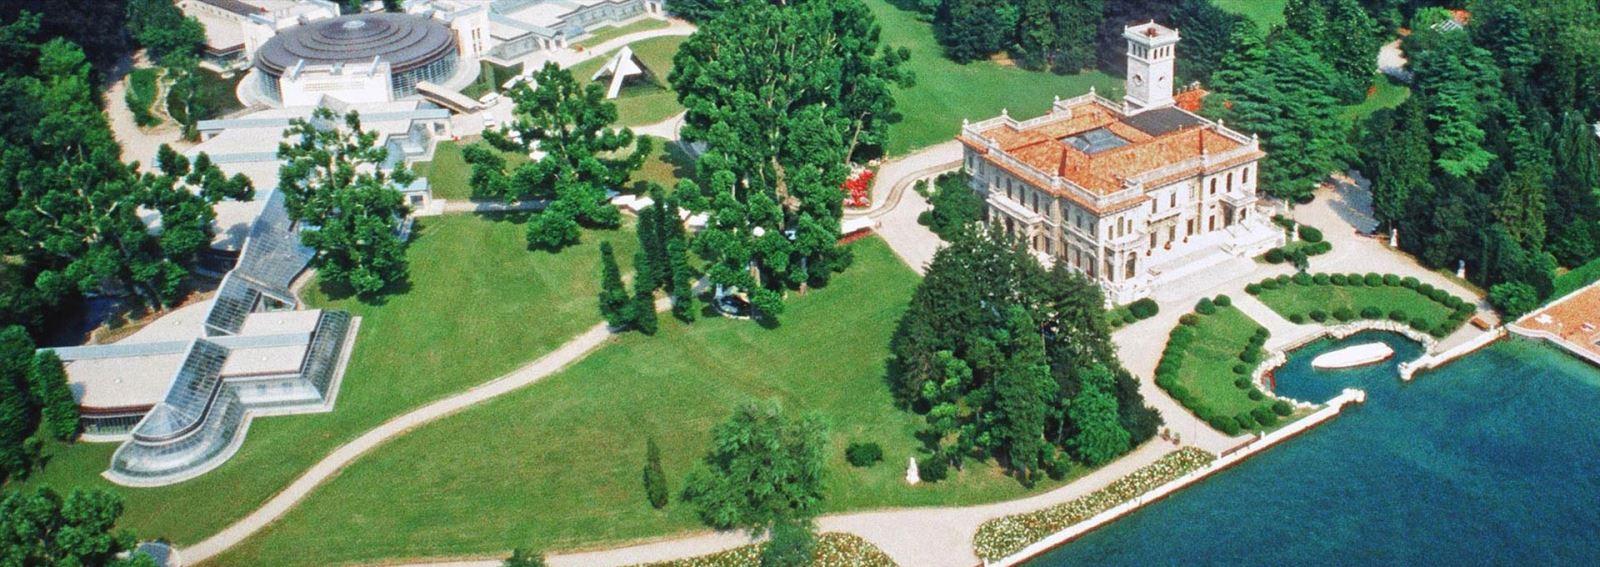 Villa Perego Di Cremnago Prezzi